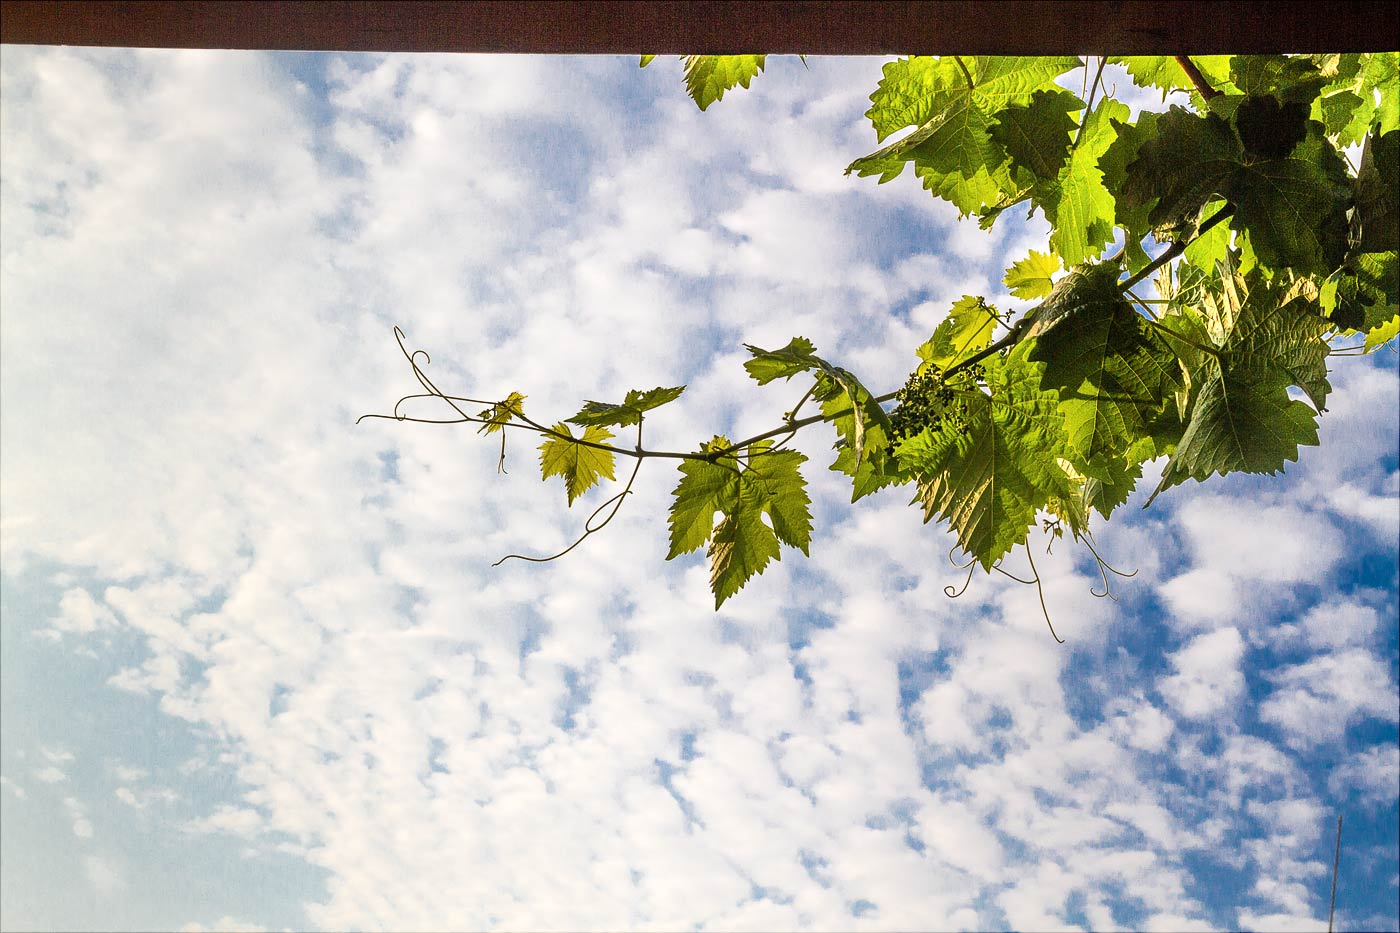 Утренний вид в балконном окне